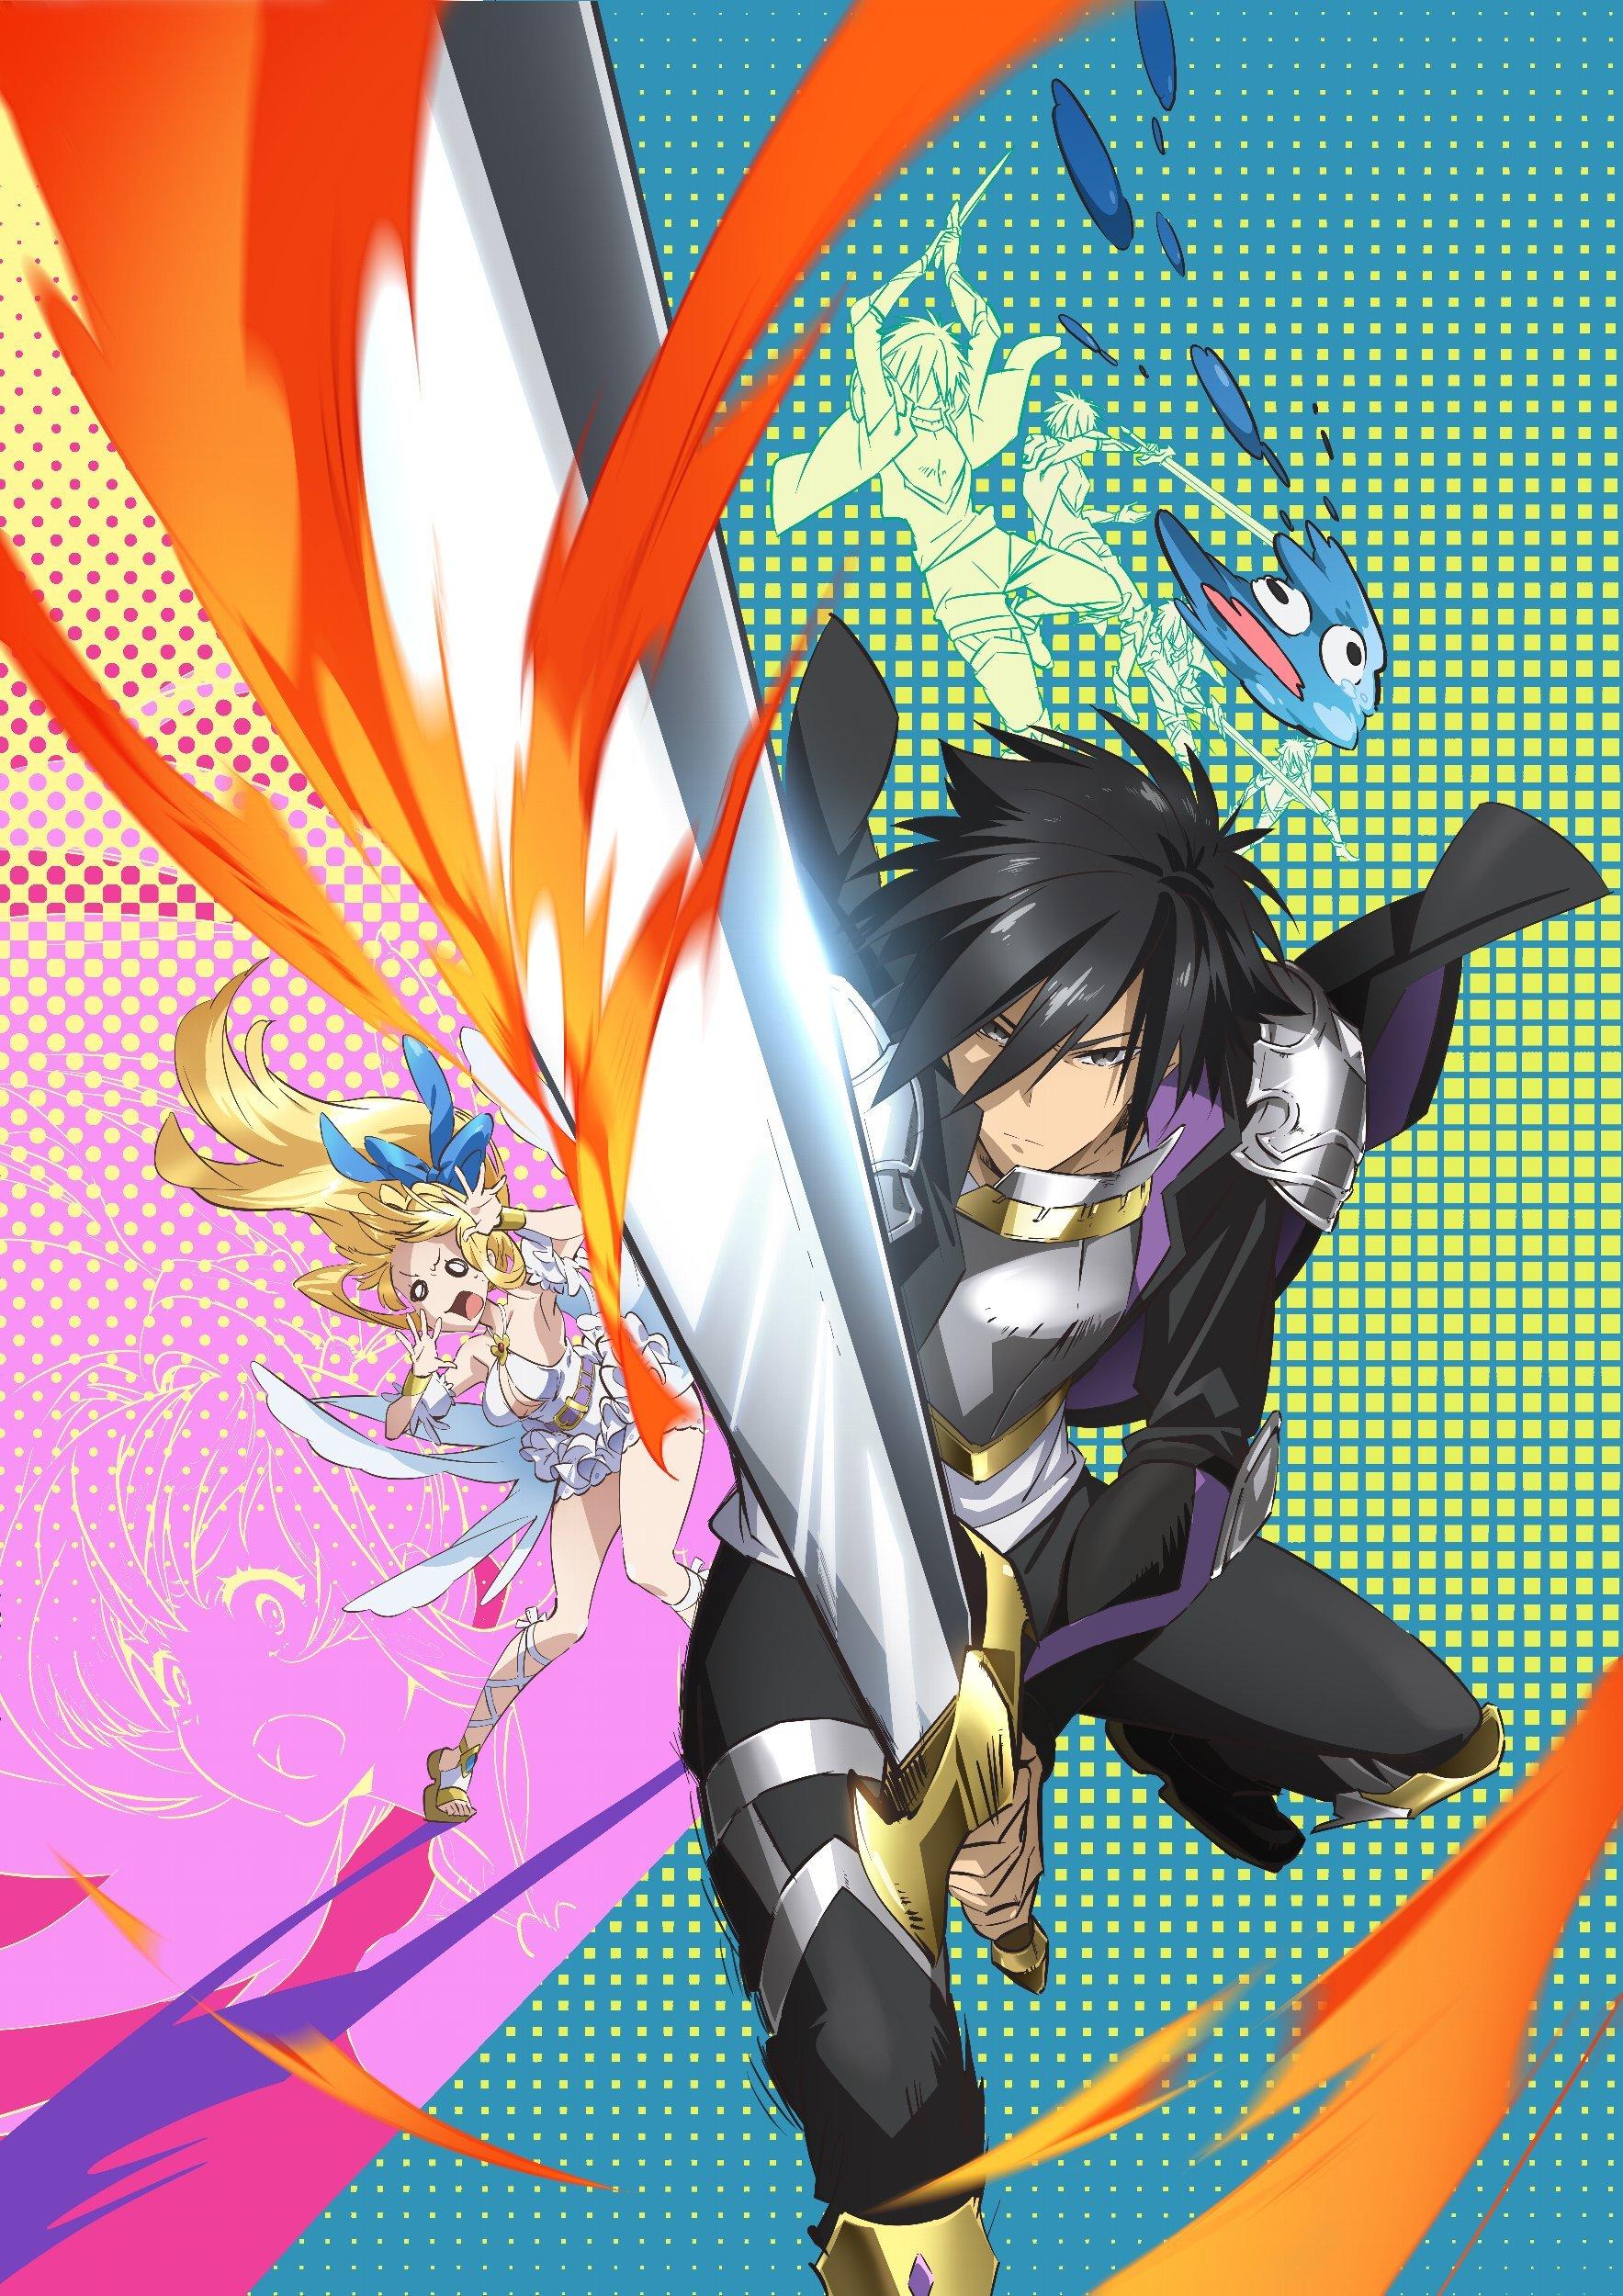 TVアニメ『慎重勇者』 ©土日月・とよた瑣織/KADOKAWA/慎重勇者製作委員会